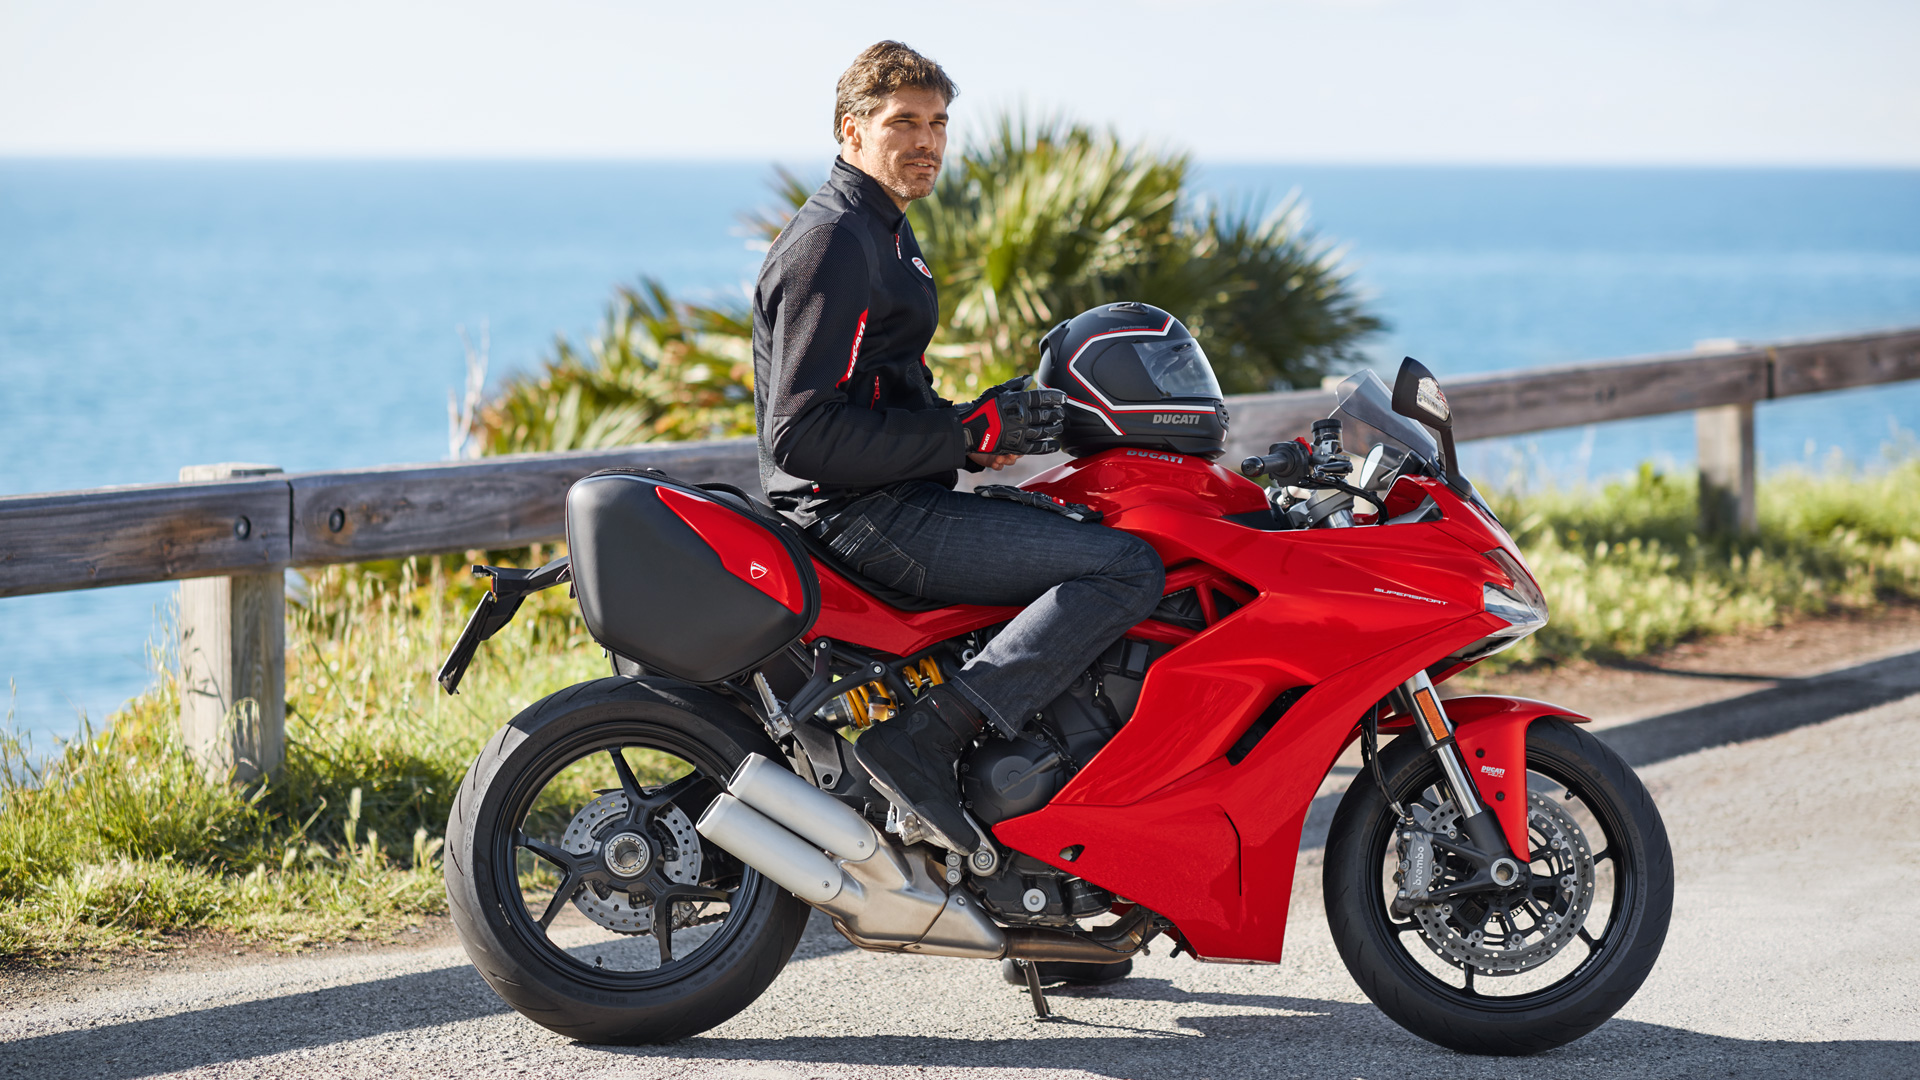 Ducati Supersport For Sale